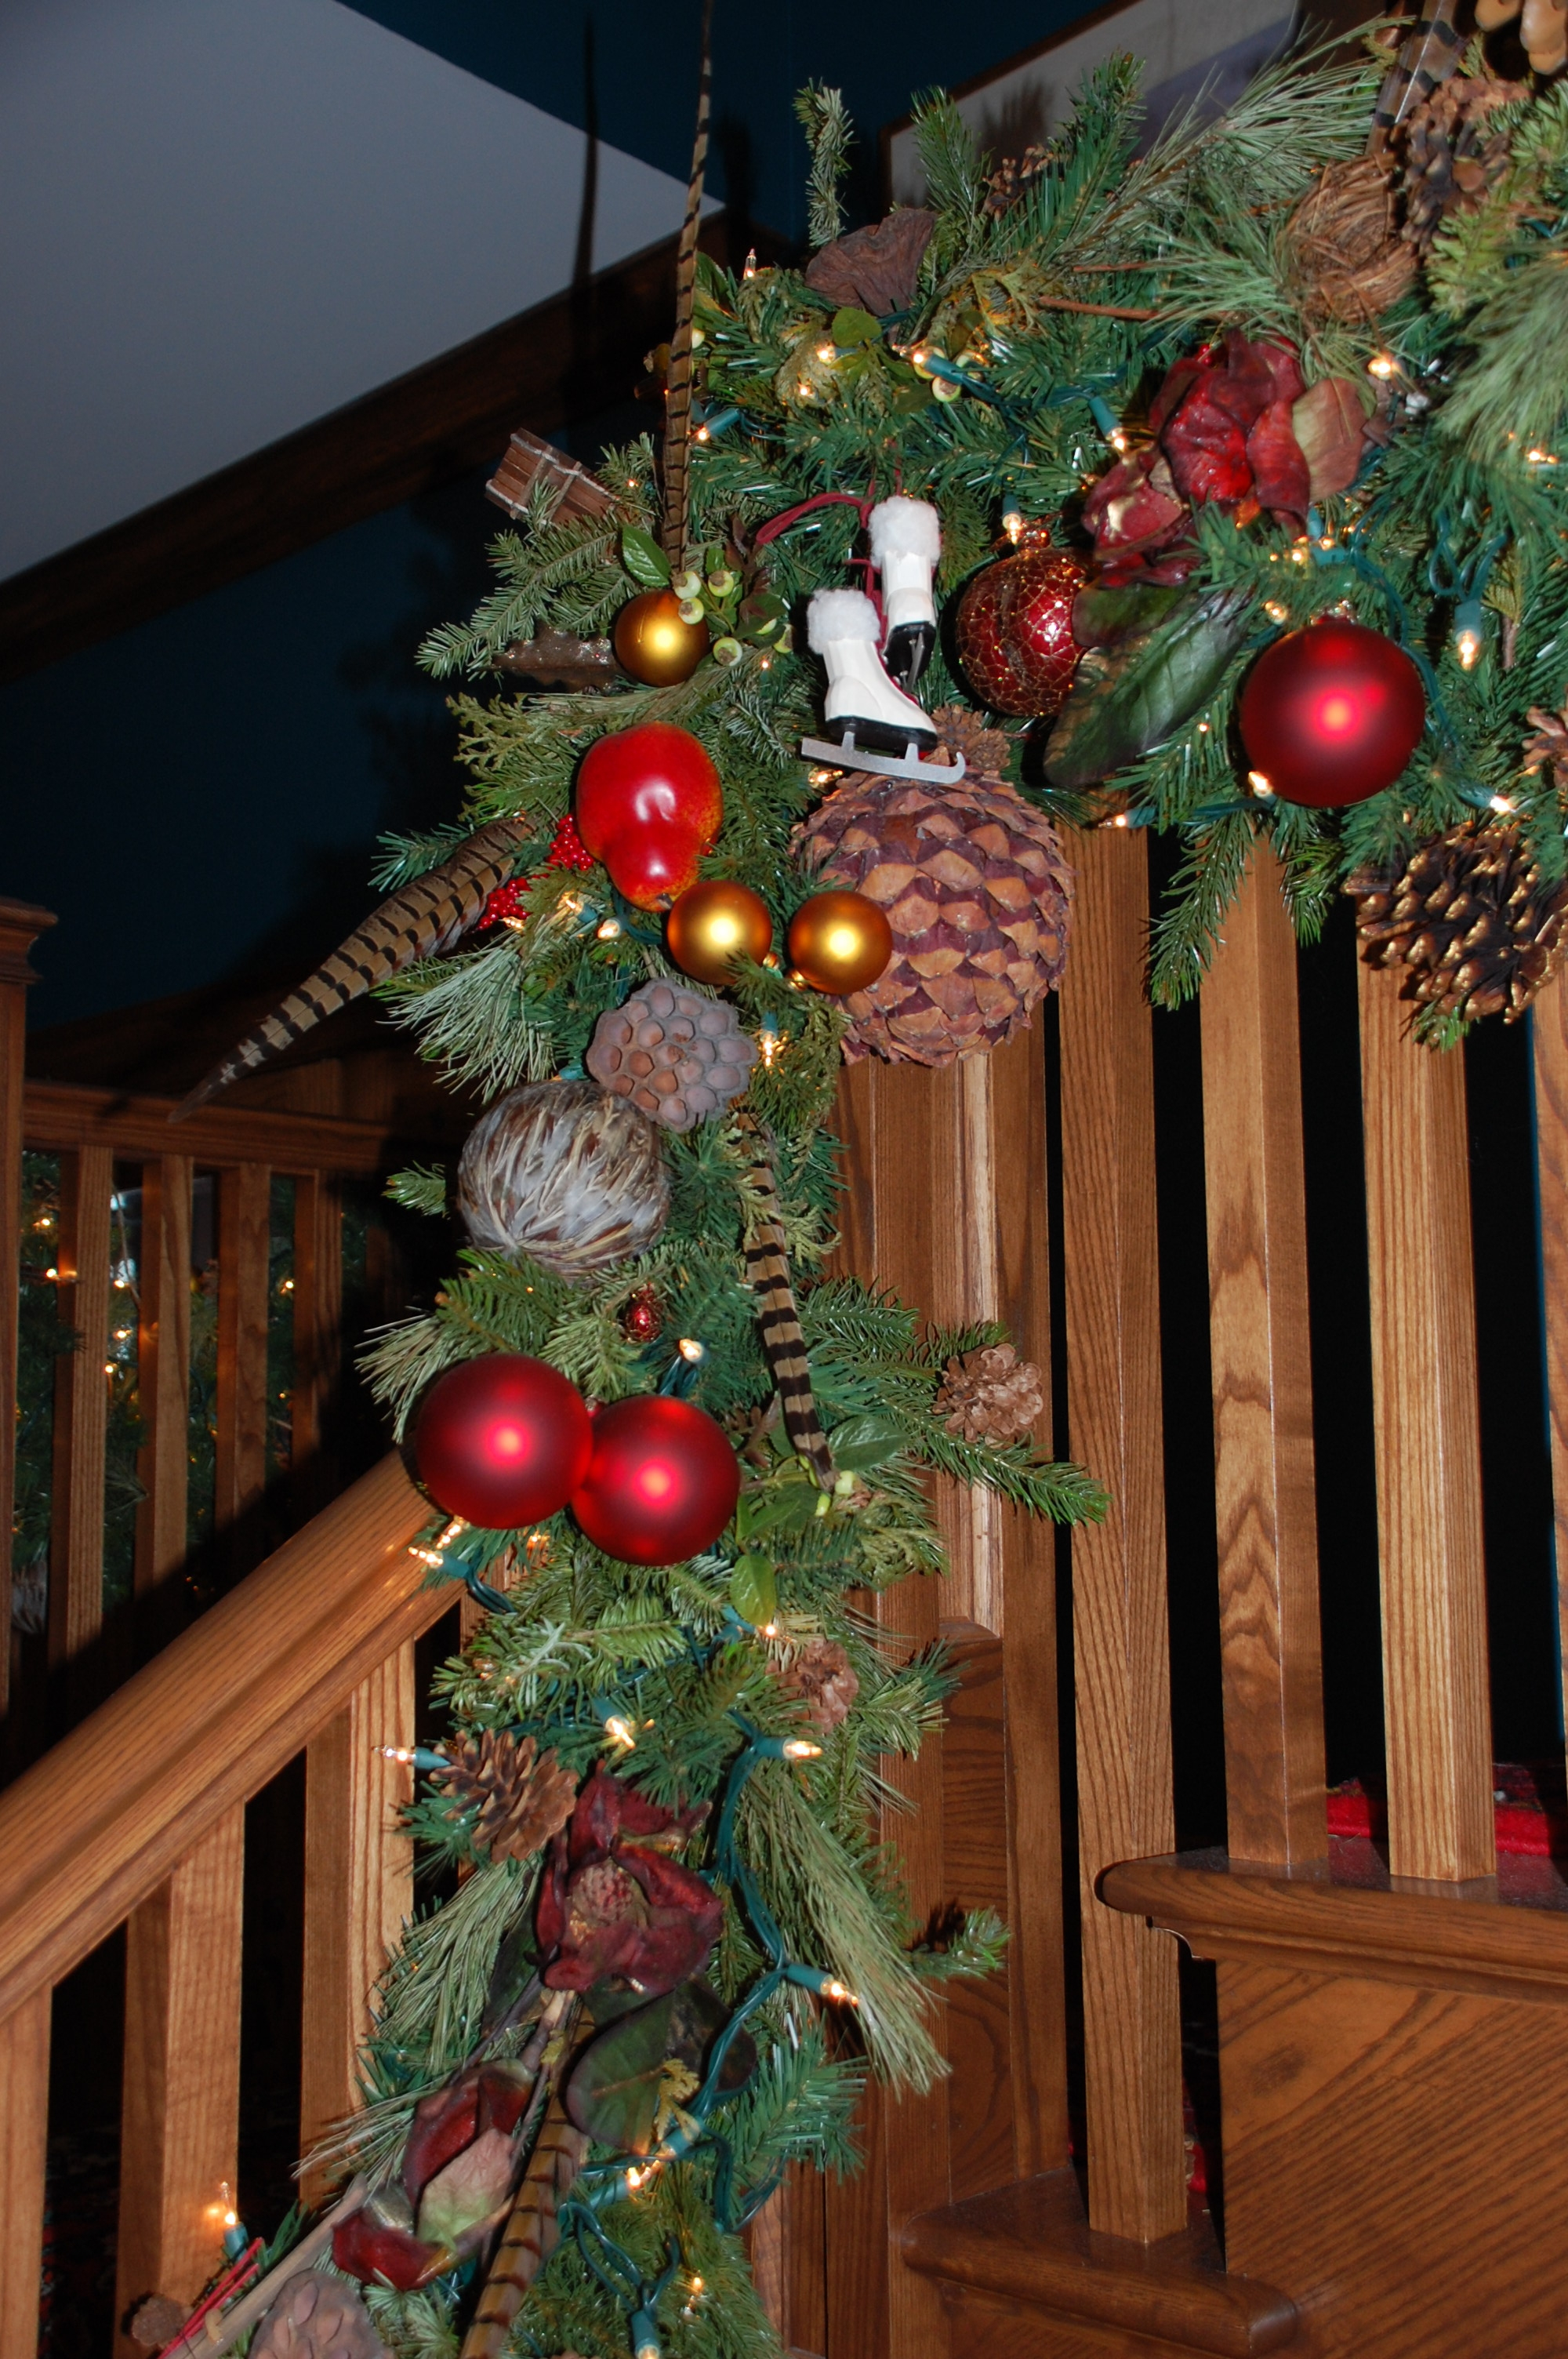 Boston interior designer, Elizabeth Swartz Interiors, uses home decor to celebrate the spirit of the season.